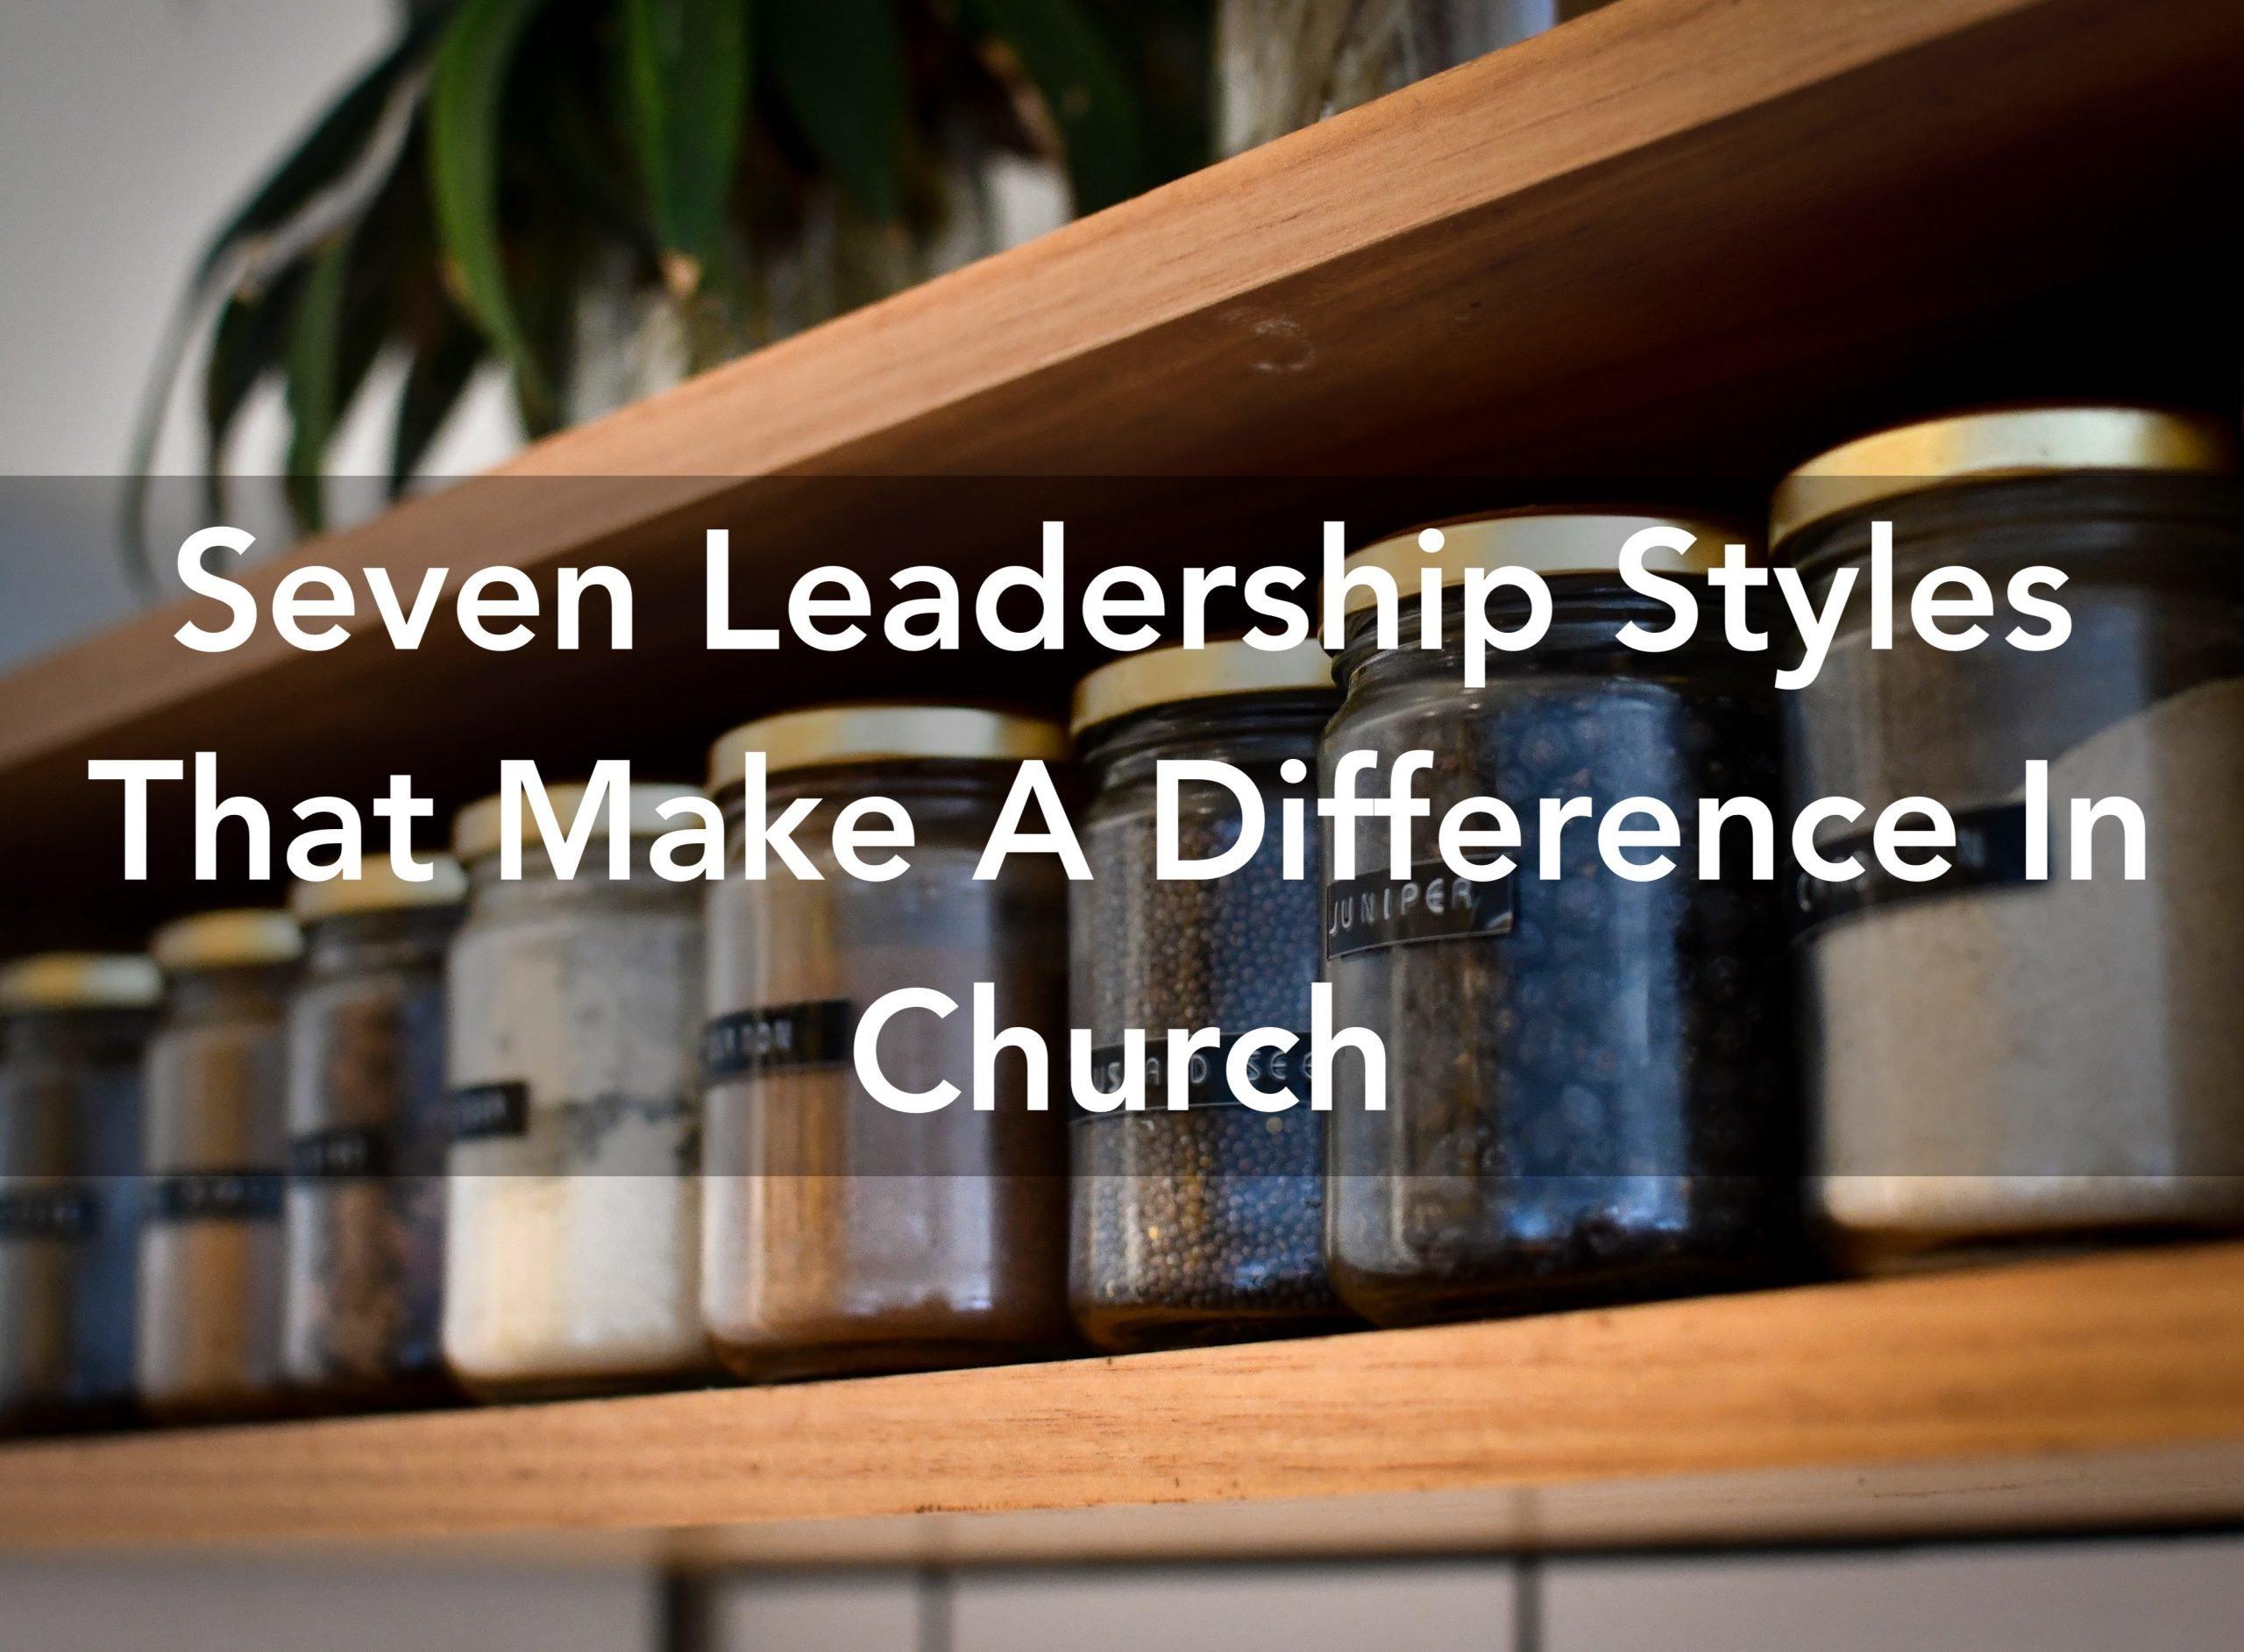 leadership styles in church